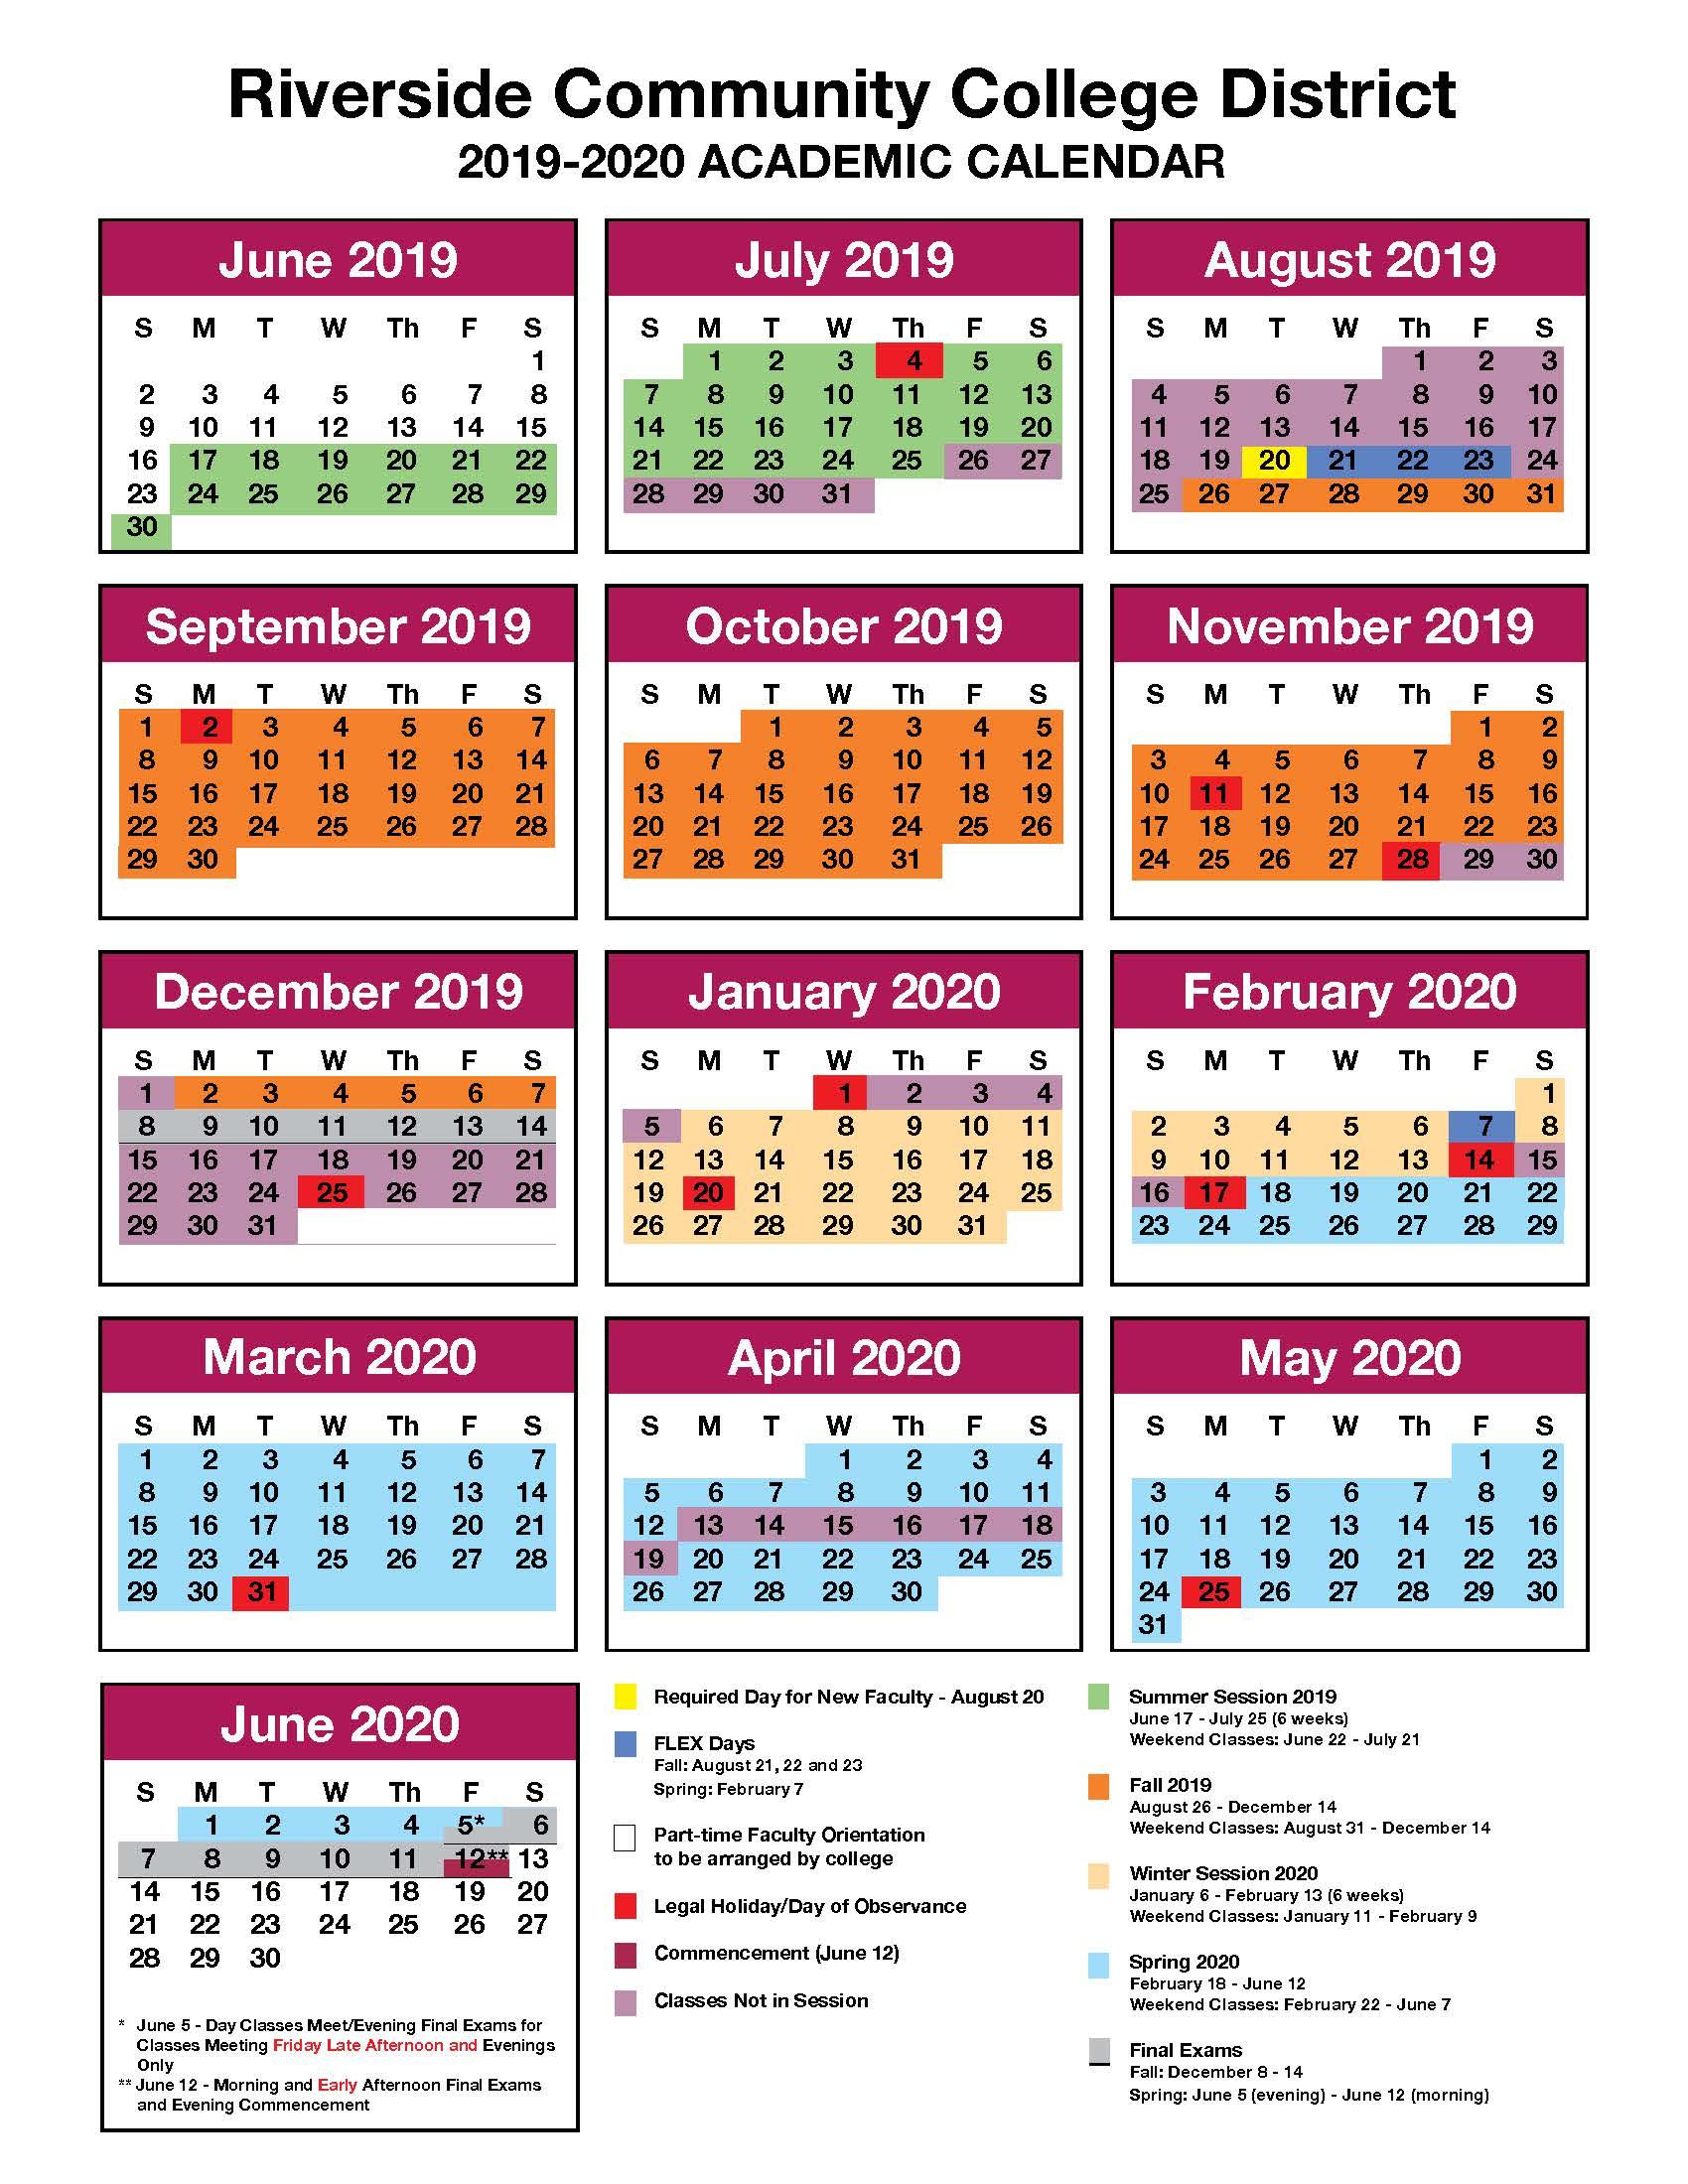 Jfk And Norco College Calendar 2019-2020 - John F. Kennedy for University Of Southern California School Calendar 2021 2020